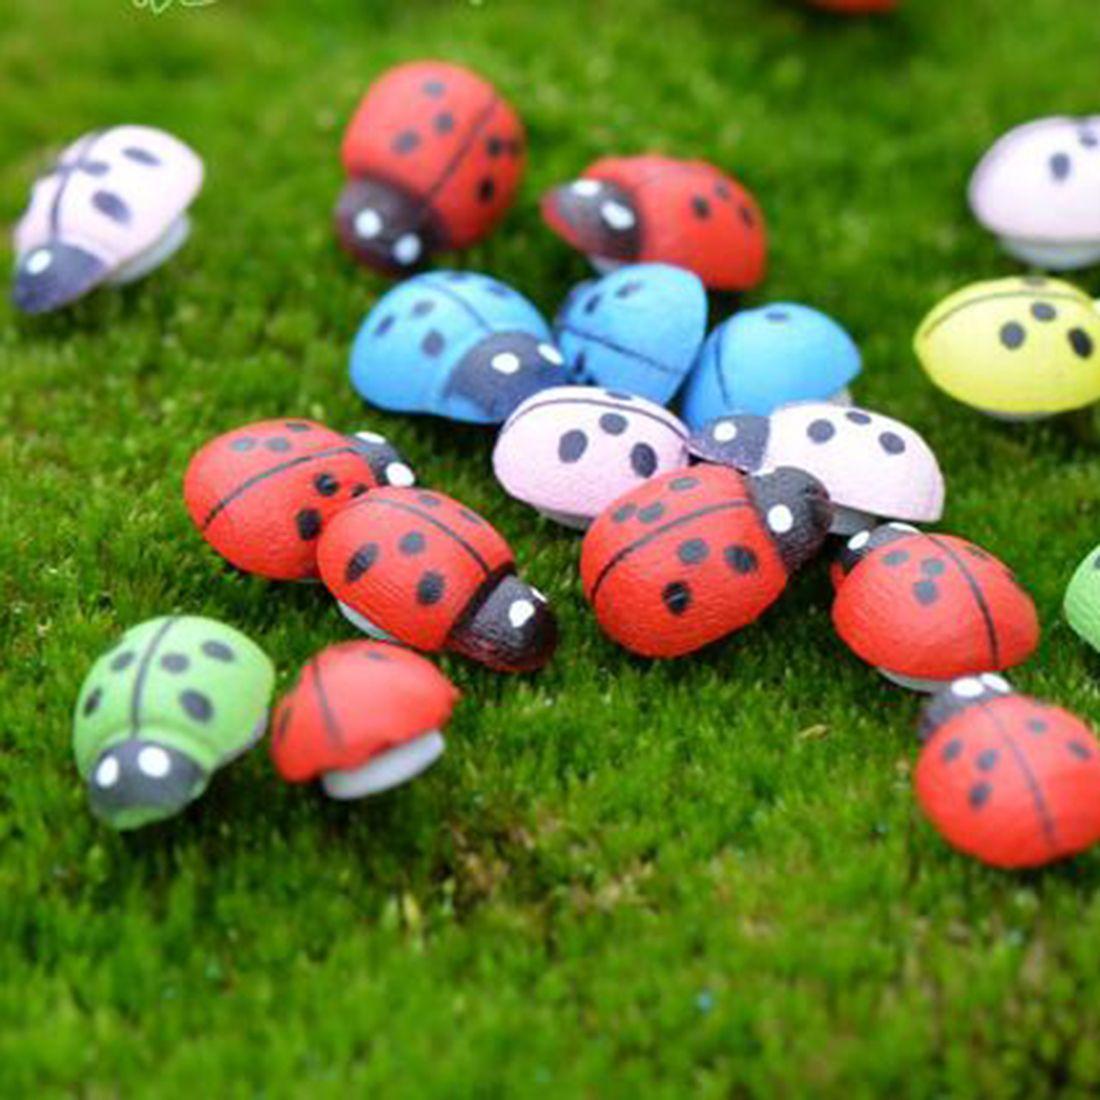 Hot sale 10pcs DIY Crafts Scrapbooking Beads Painted Wood Ladybug ...